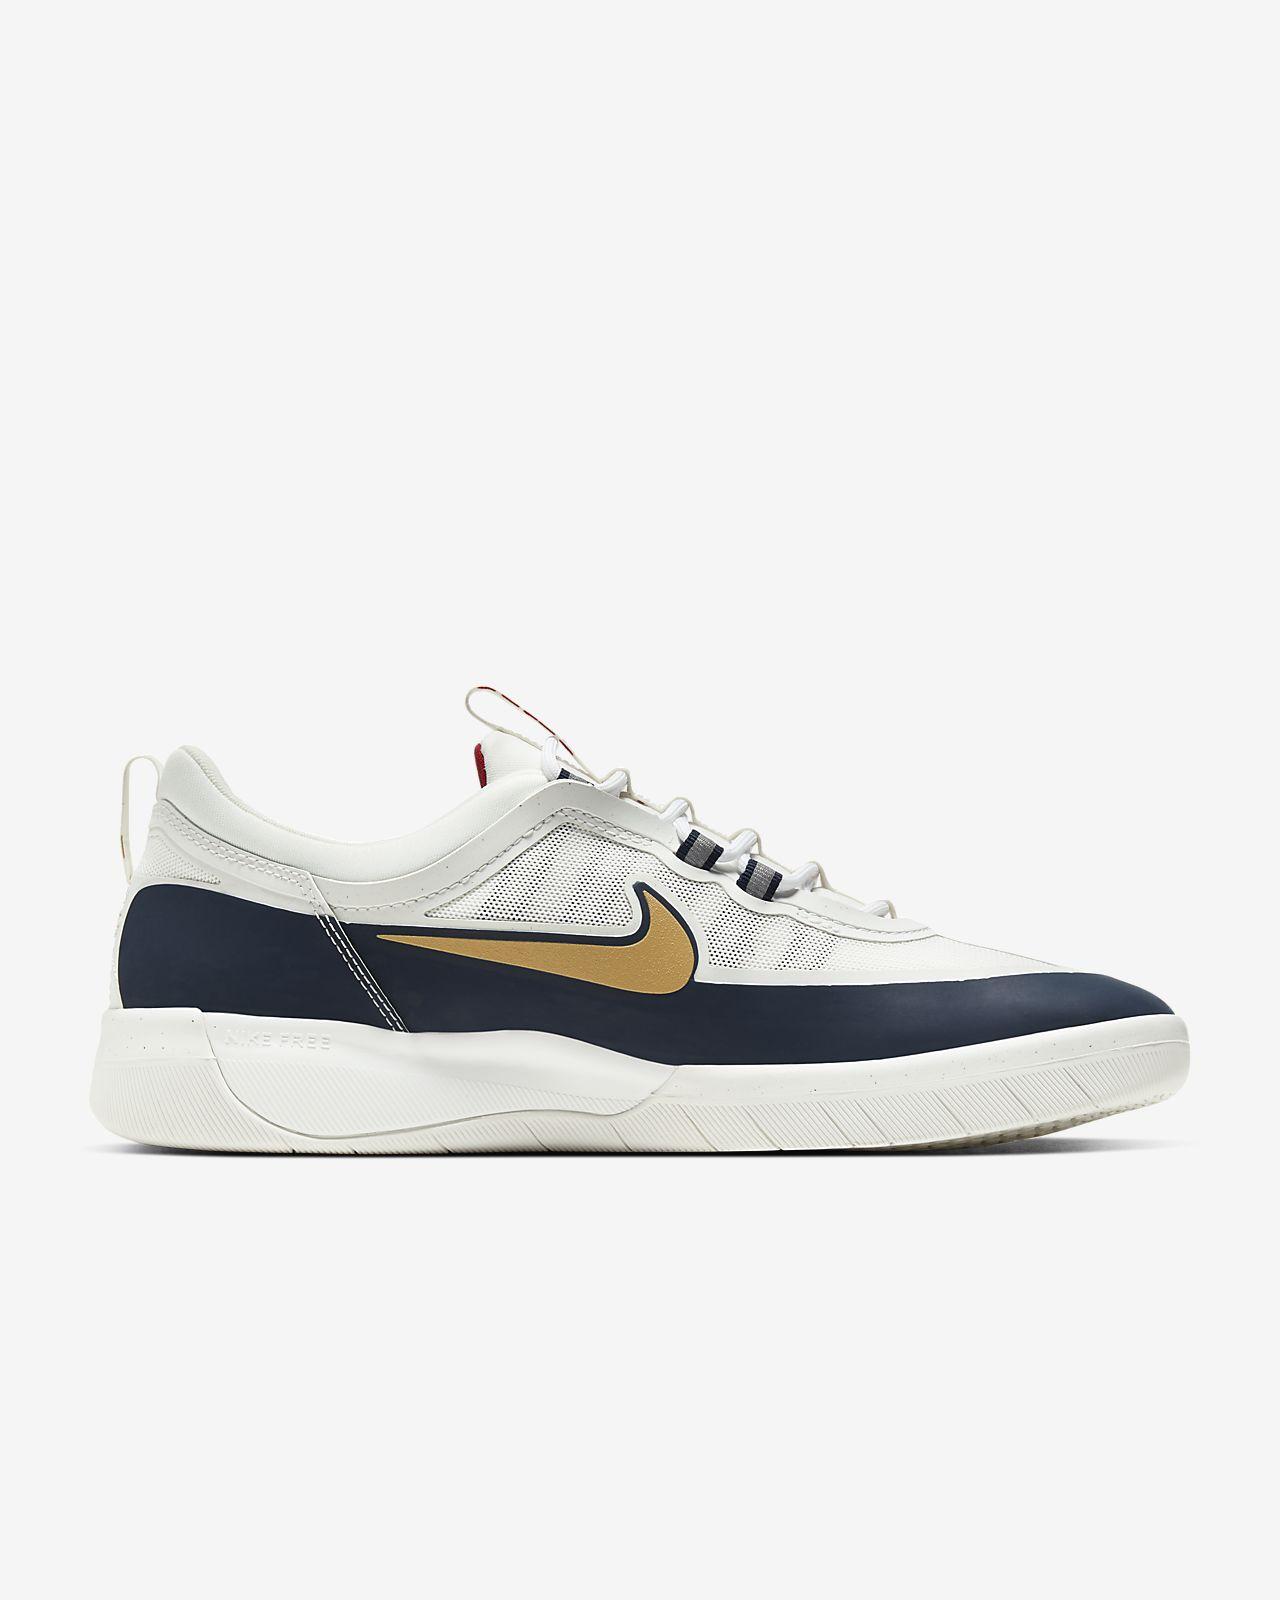 rebanada Barrio pintar  Nike SB Nyjah Free 2 Skate Shoe. Nike IL